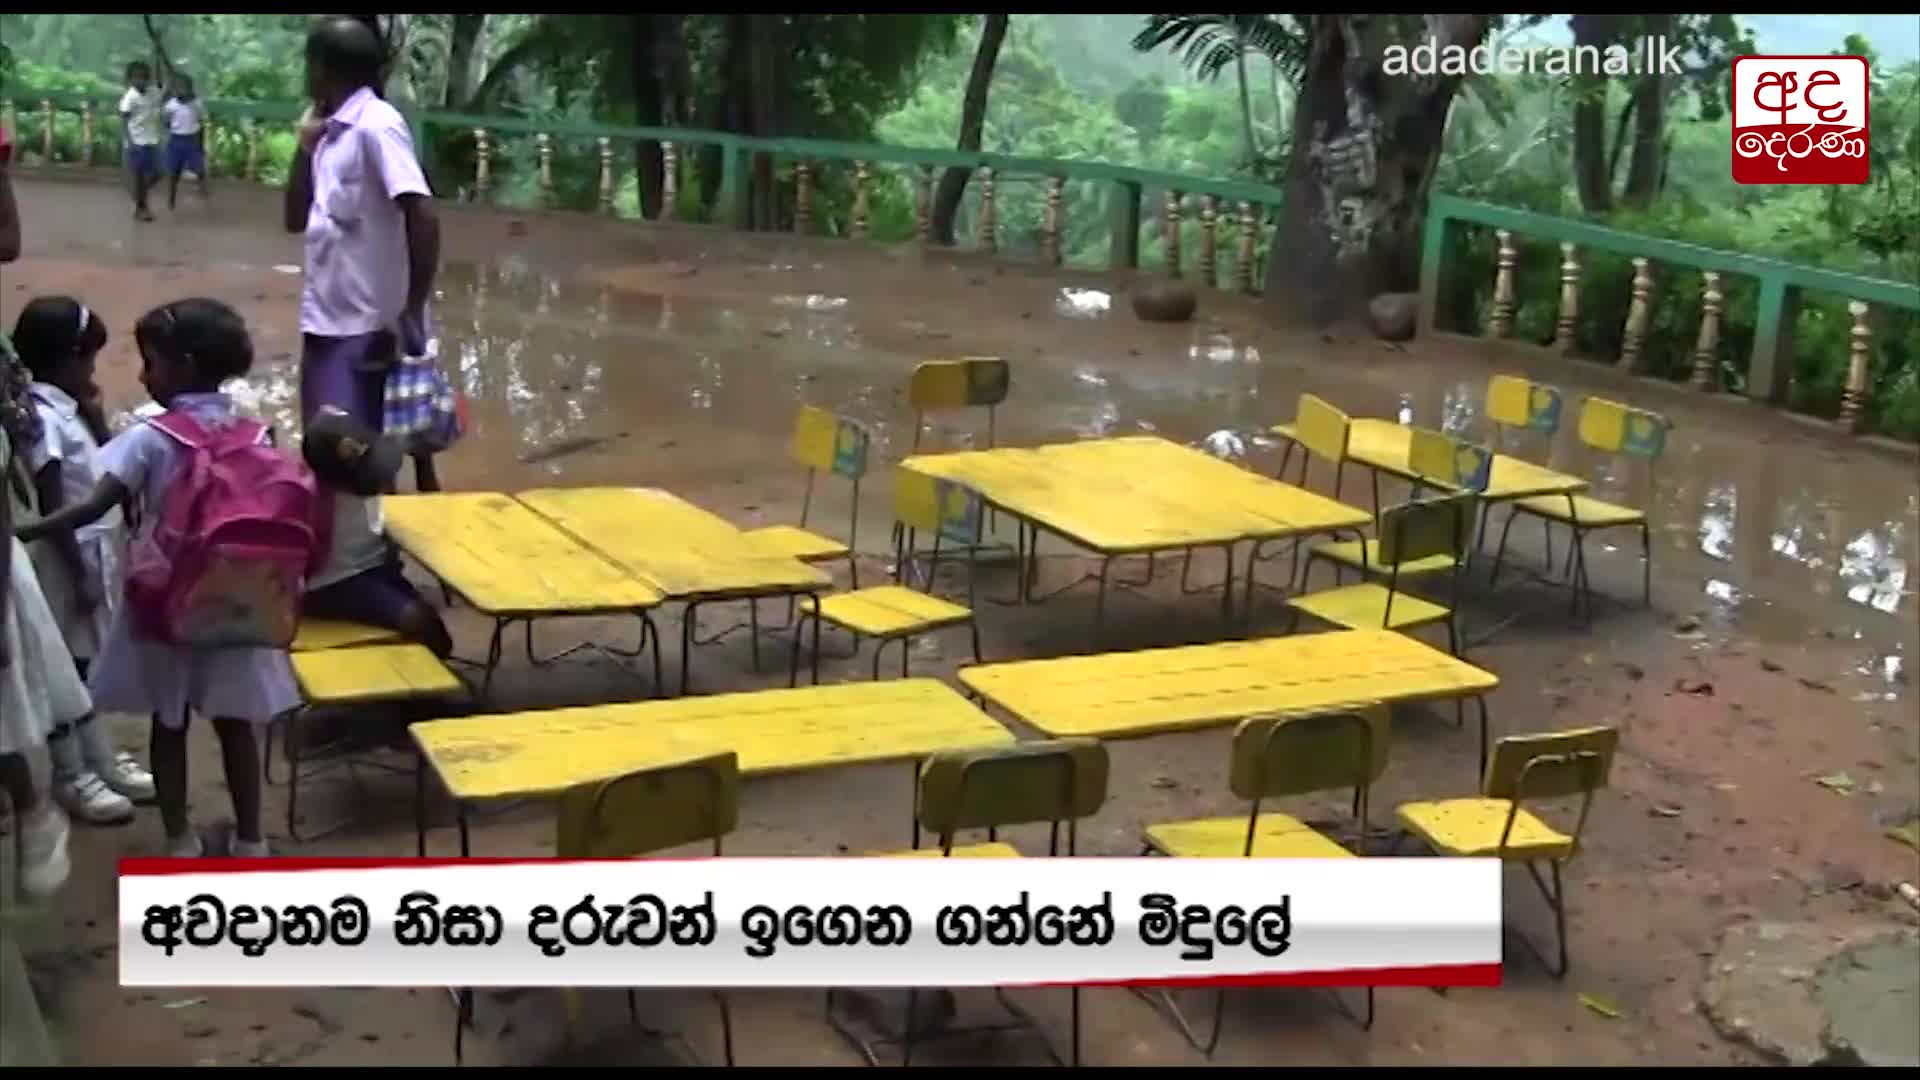 Horaheenella Sumana College in Ratnapura suffers without basic facilities